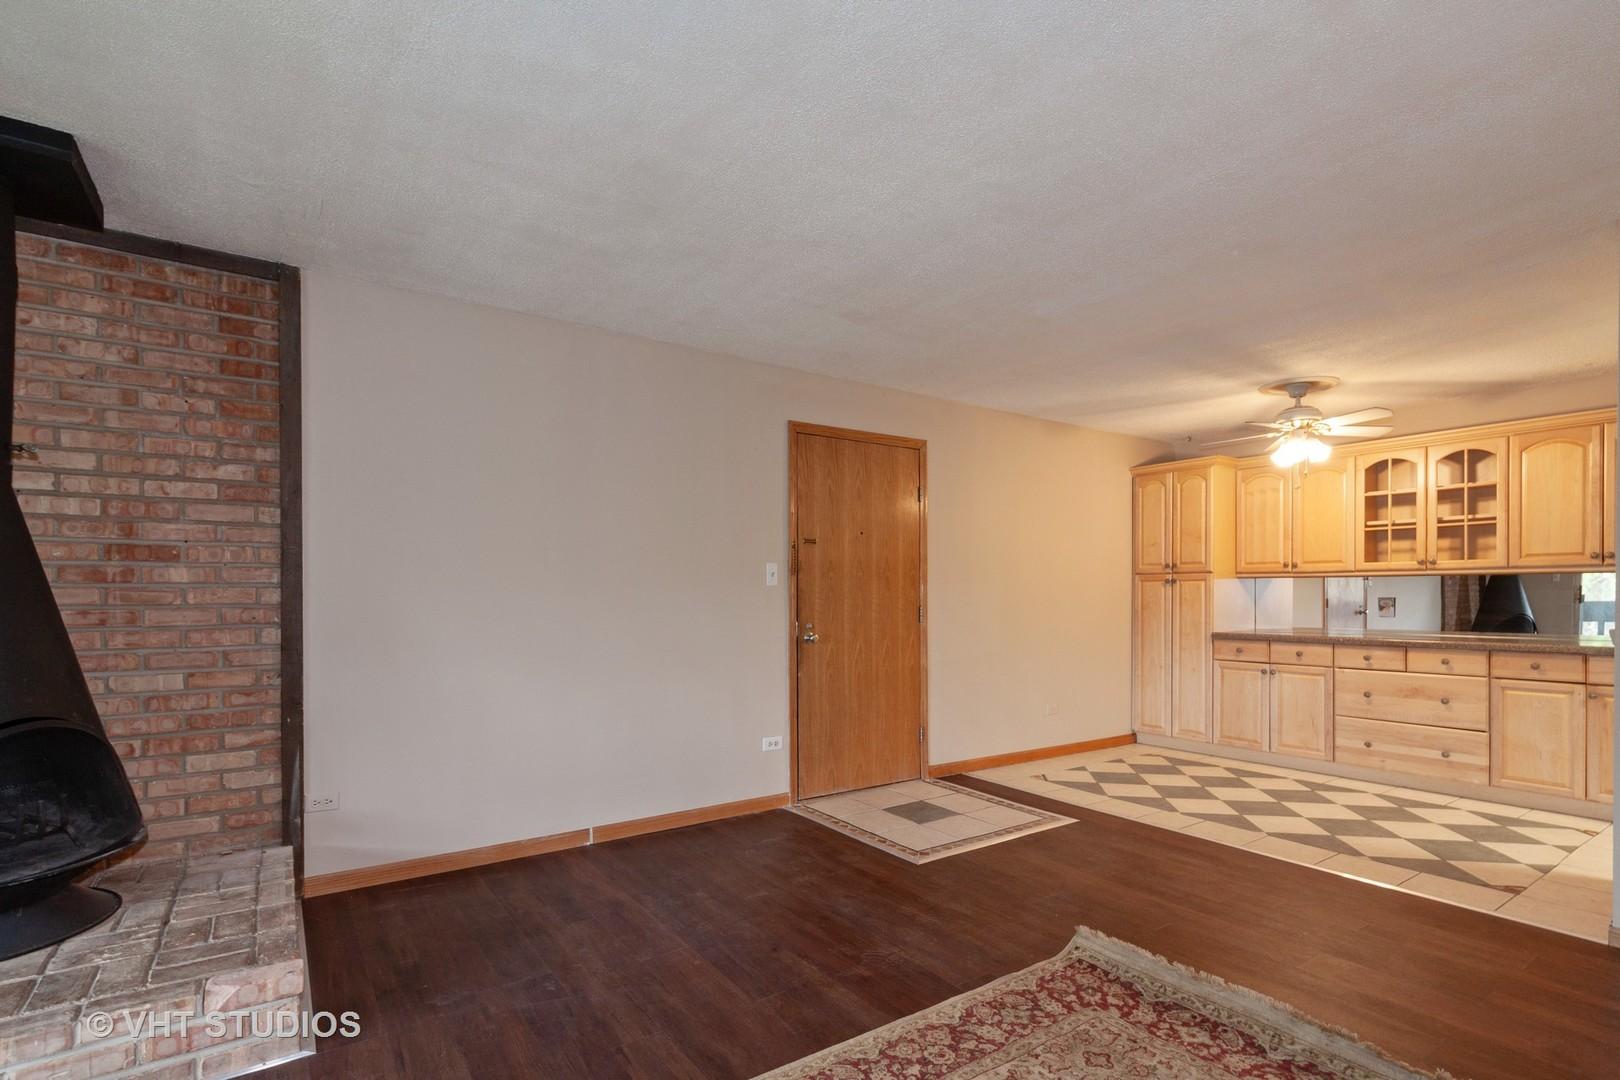 6142 Knoll Wick 203, WILLOWBROOK, Illinois, 60527